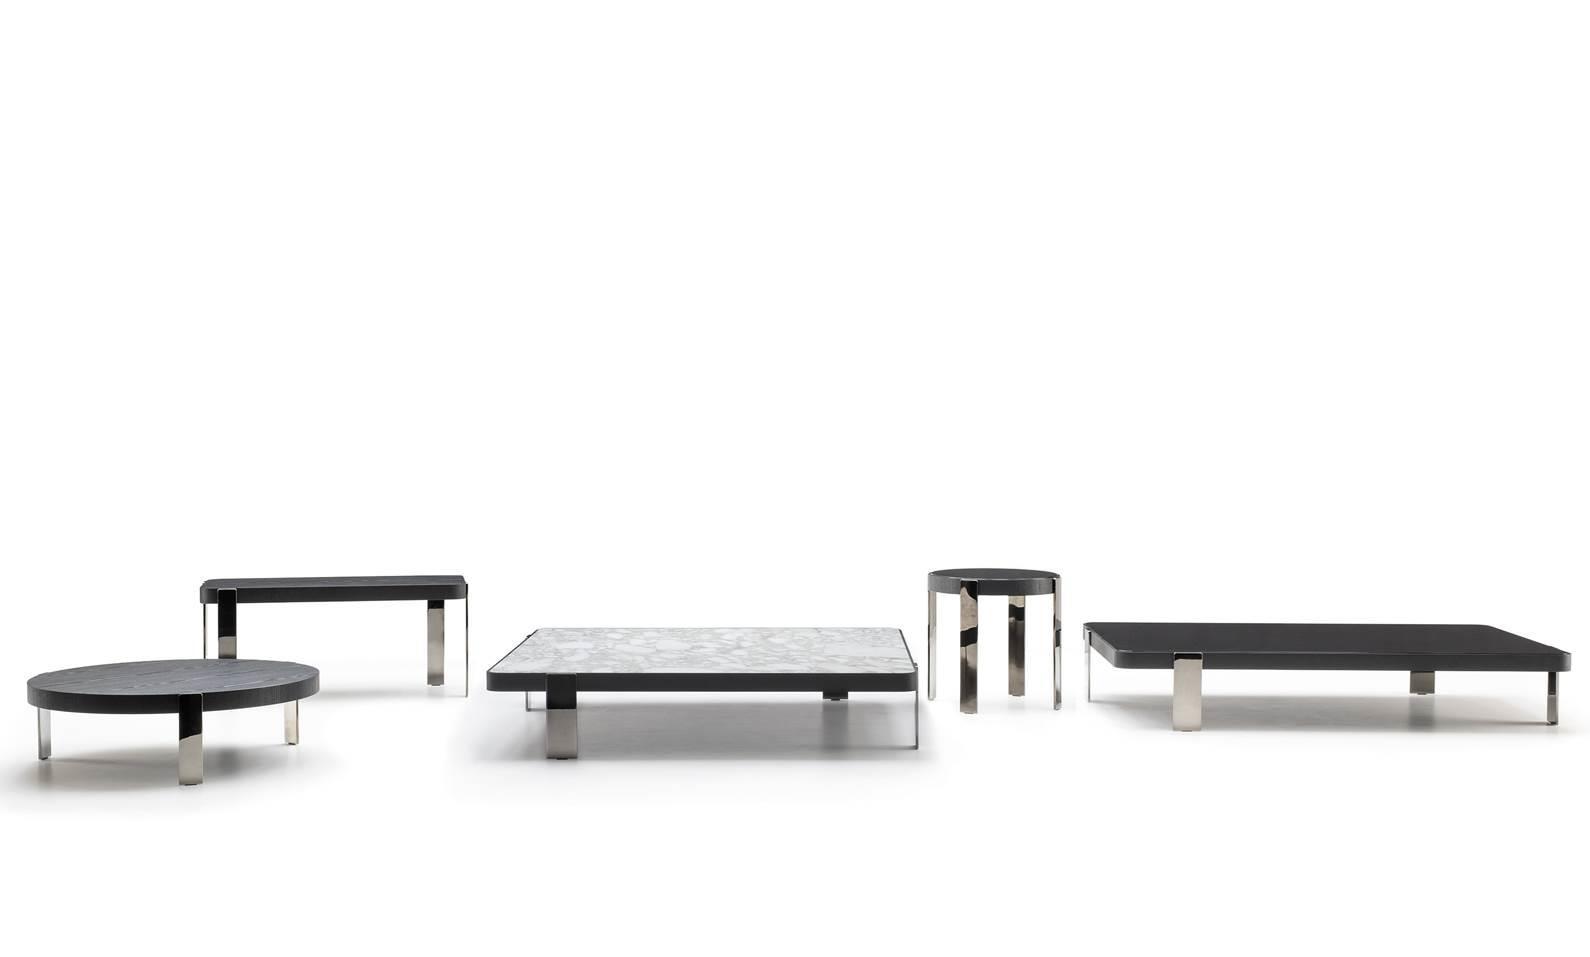 z_mattia-coffee-table-scont-01.jpg